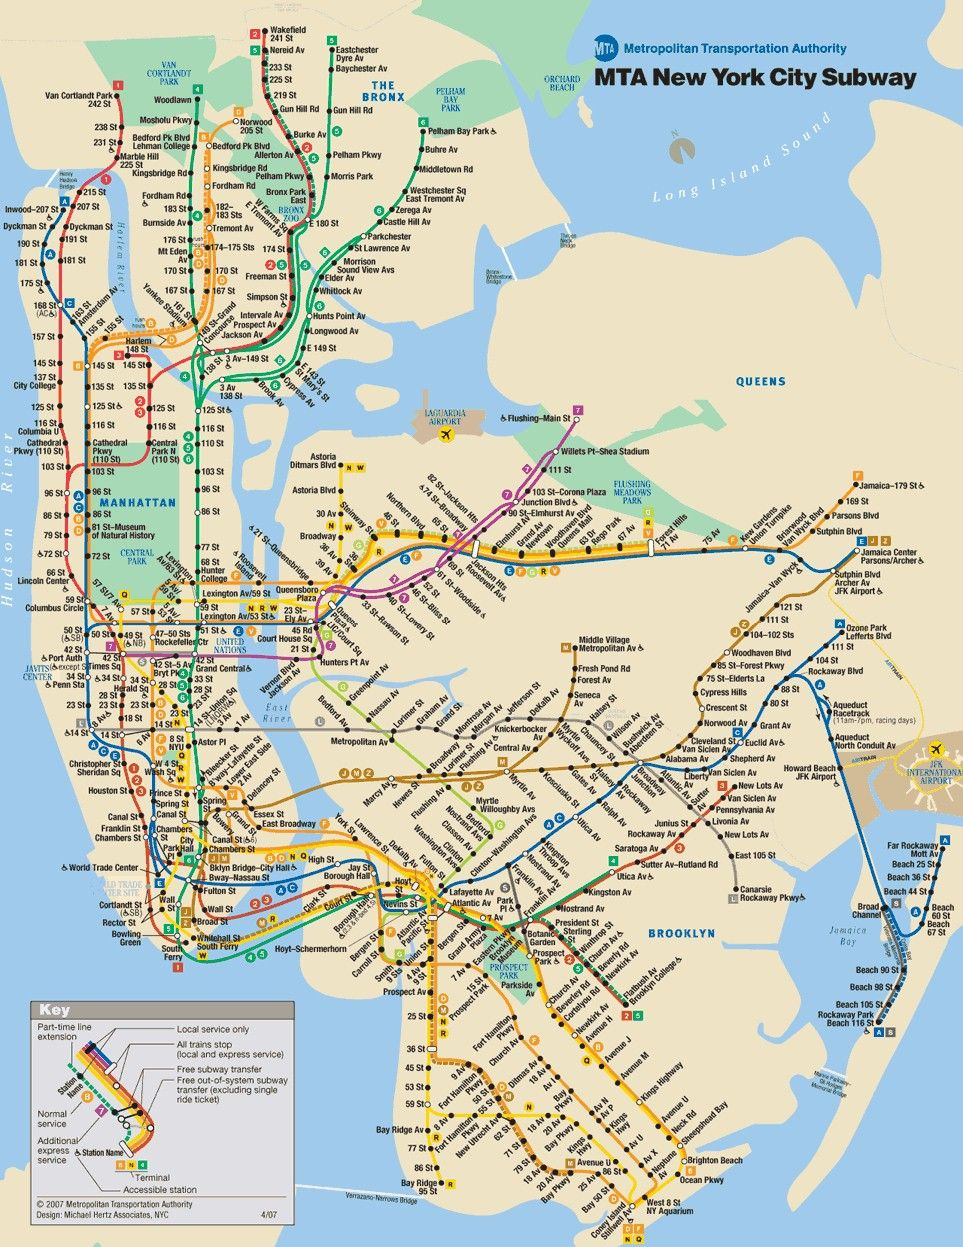 Vintage New York Subway Maps | New York City Subway Map Printable - Printable Nyc Subway Map